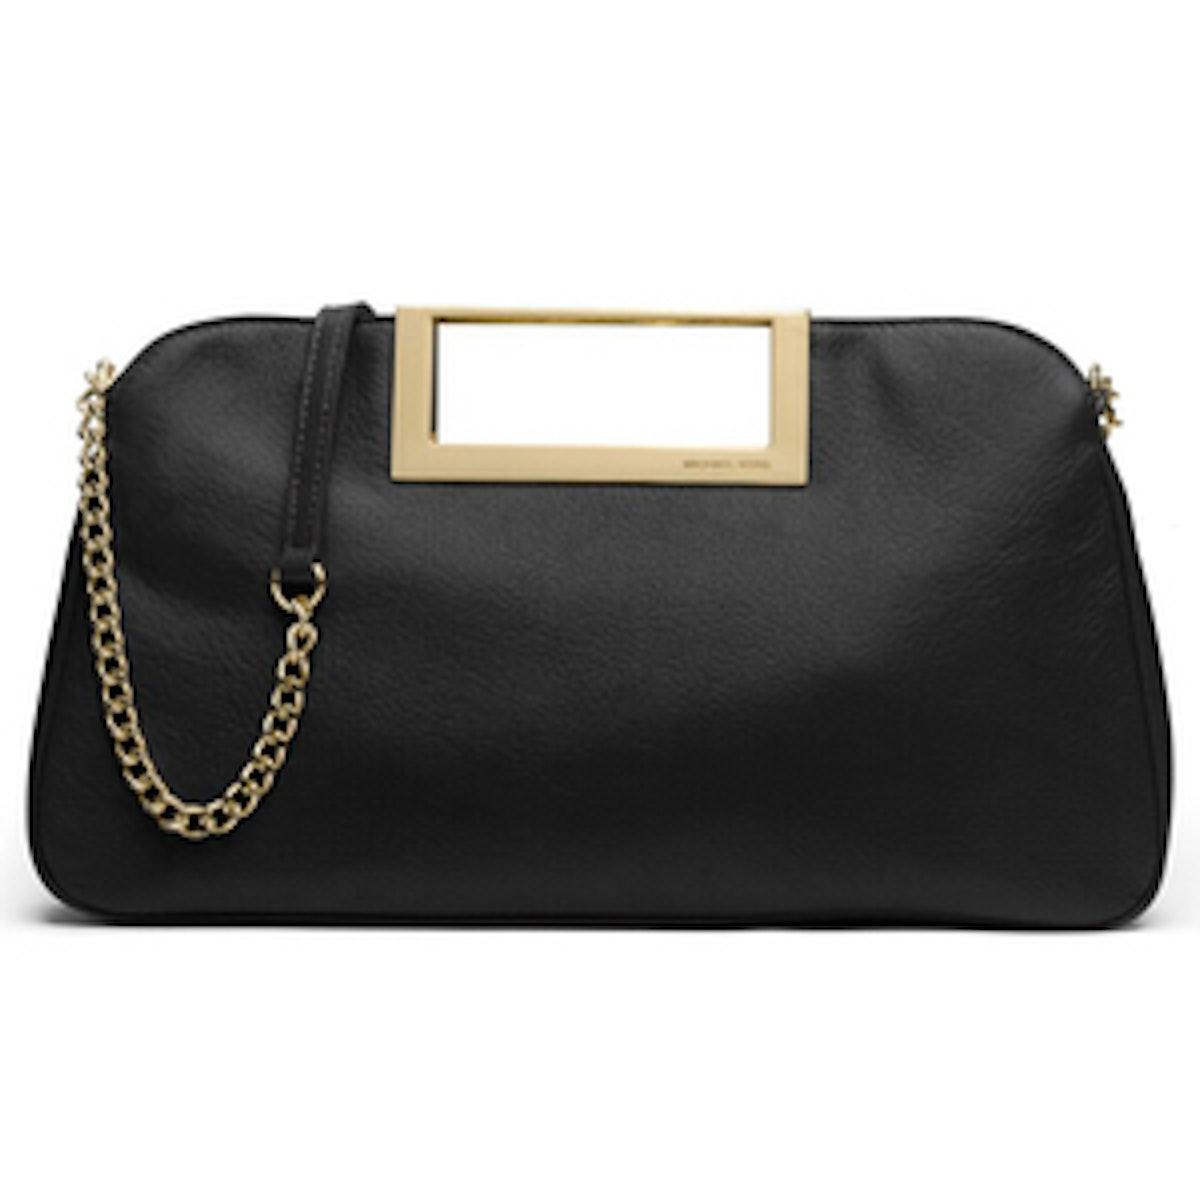 Berkley Shoulder Bag